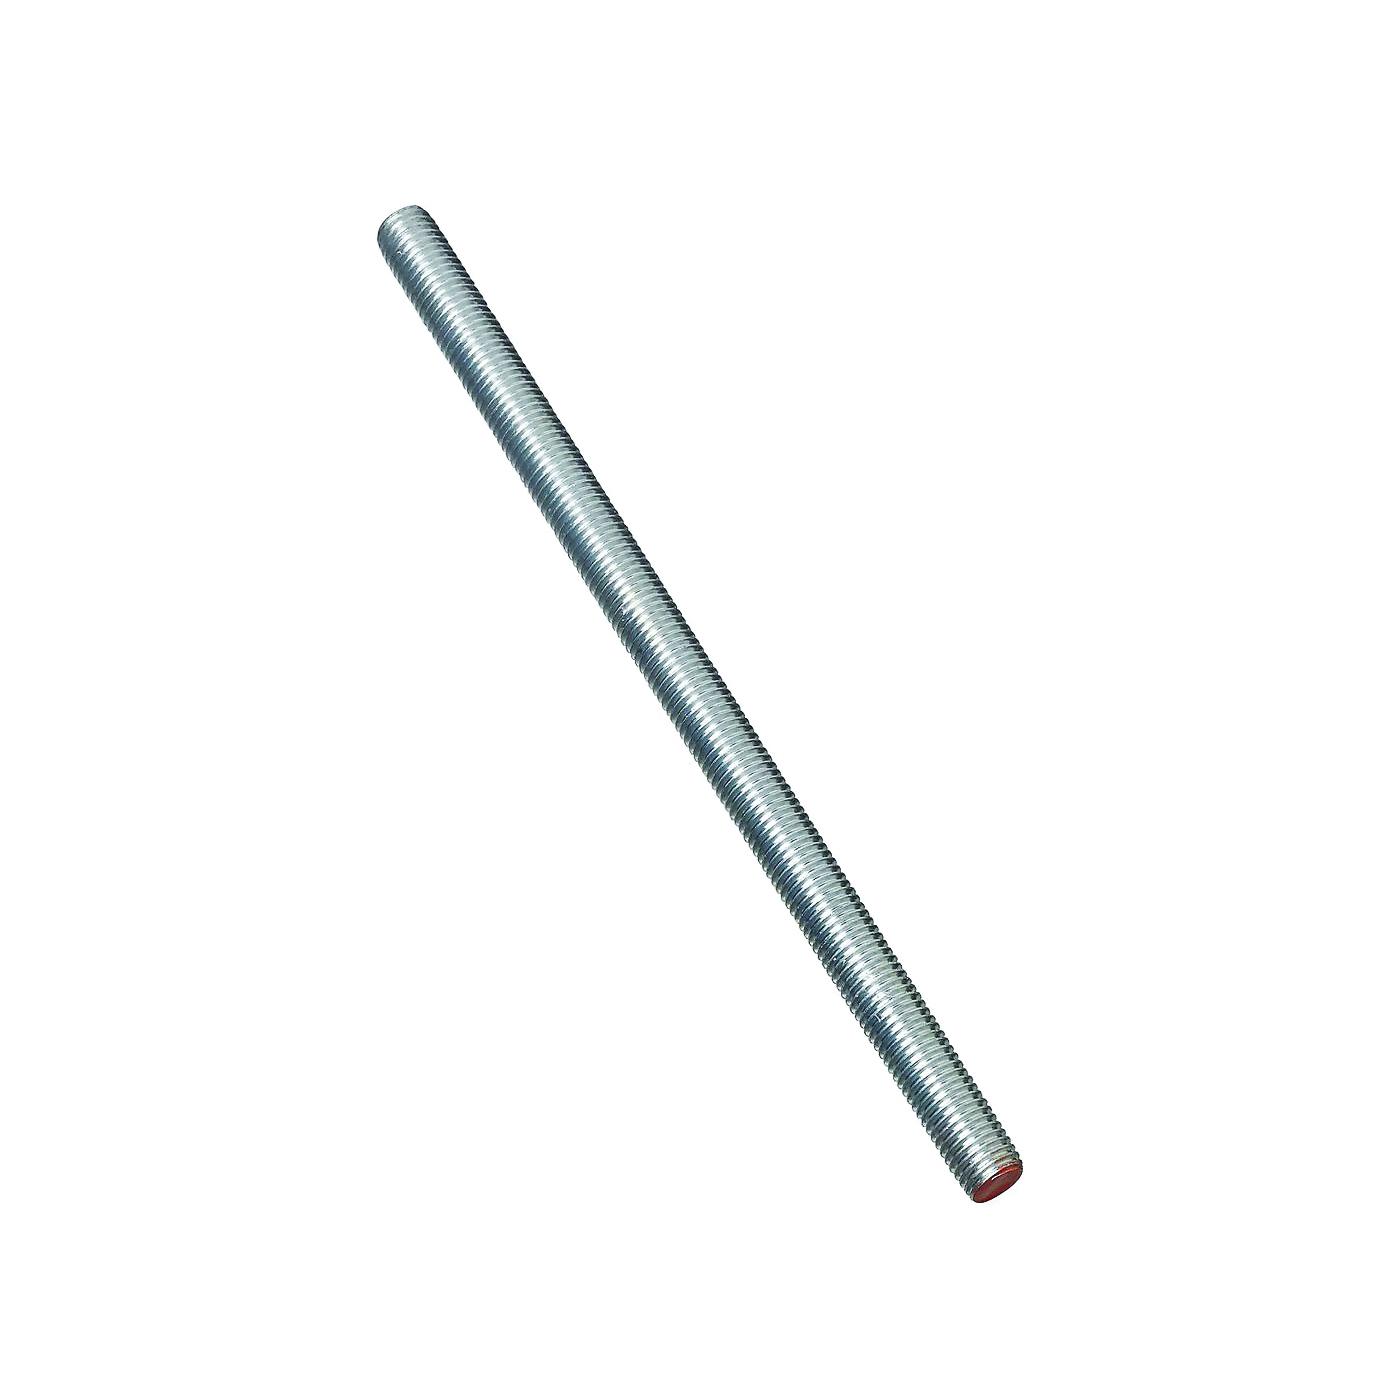 Picture of Stanley Hardware 179366 Threaded Rod, 5/8-11 Thread, 12 in L, A Grade, Steel, Zinc, UNC Thread